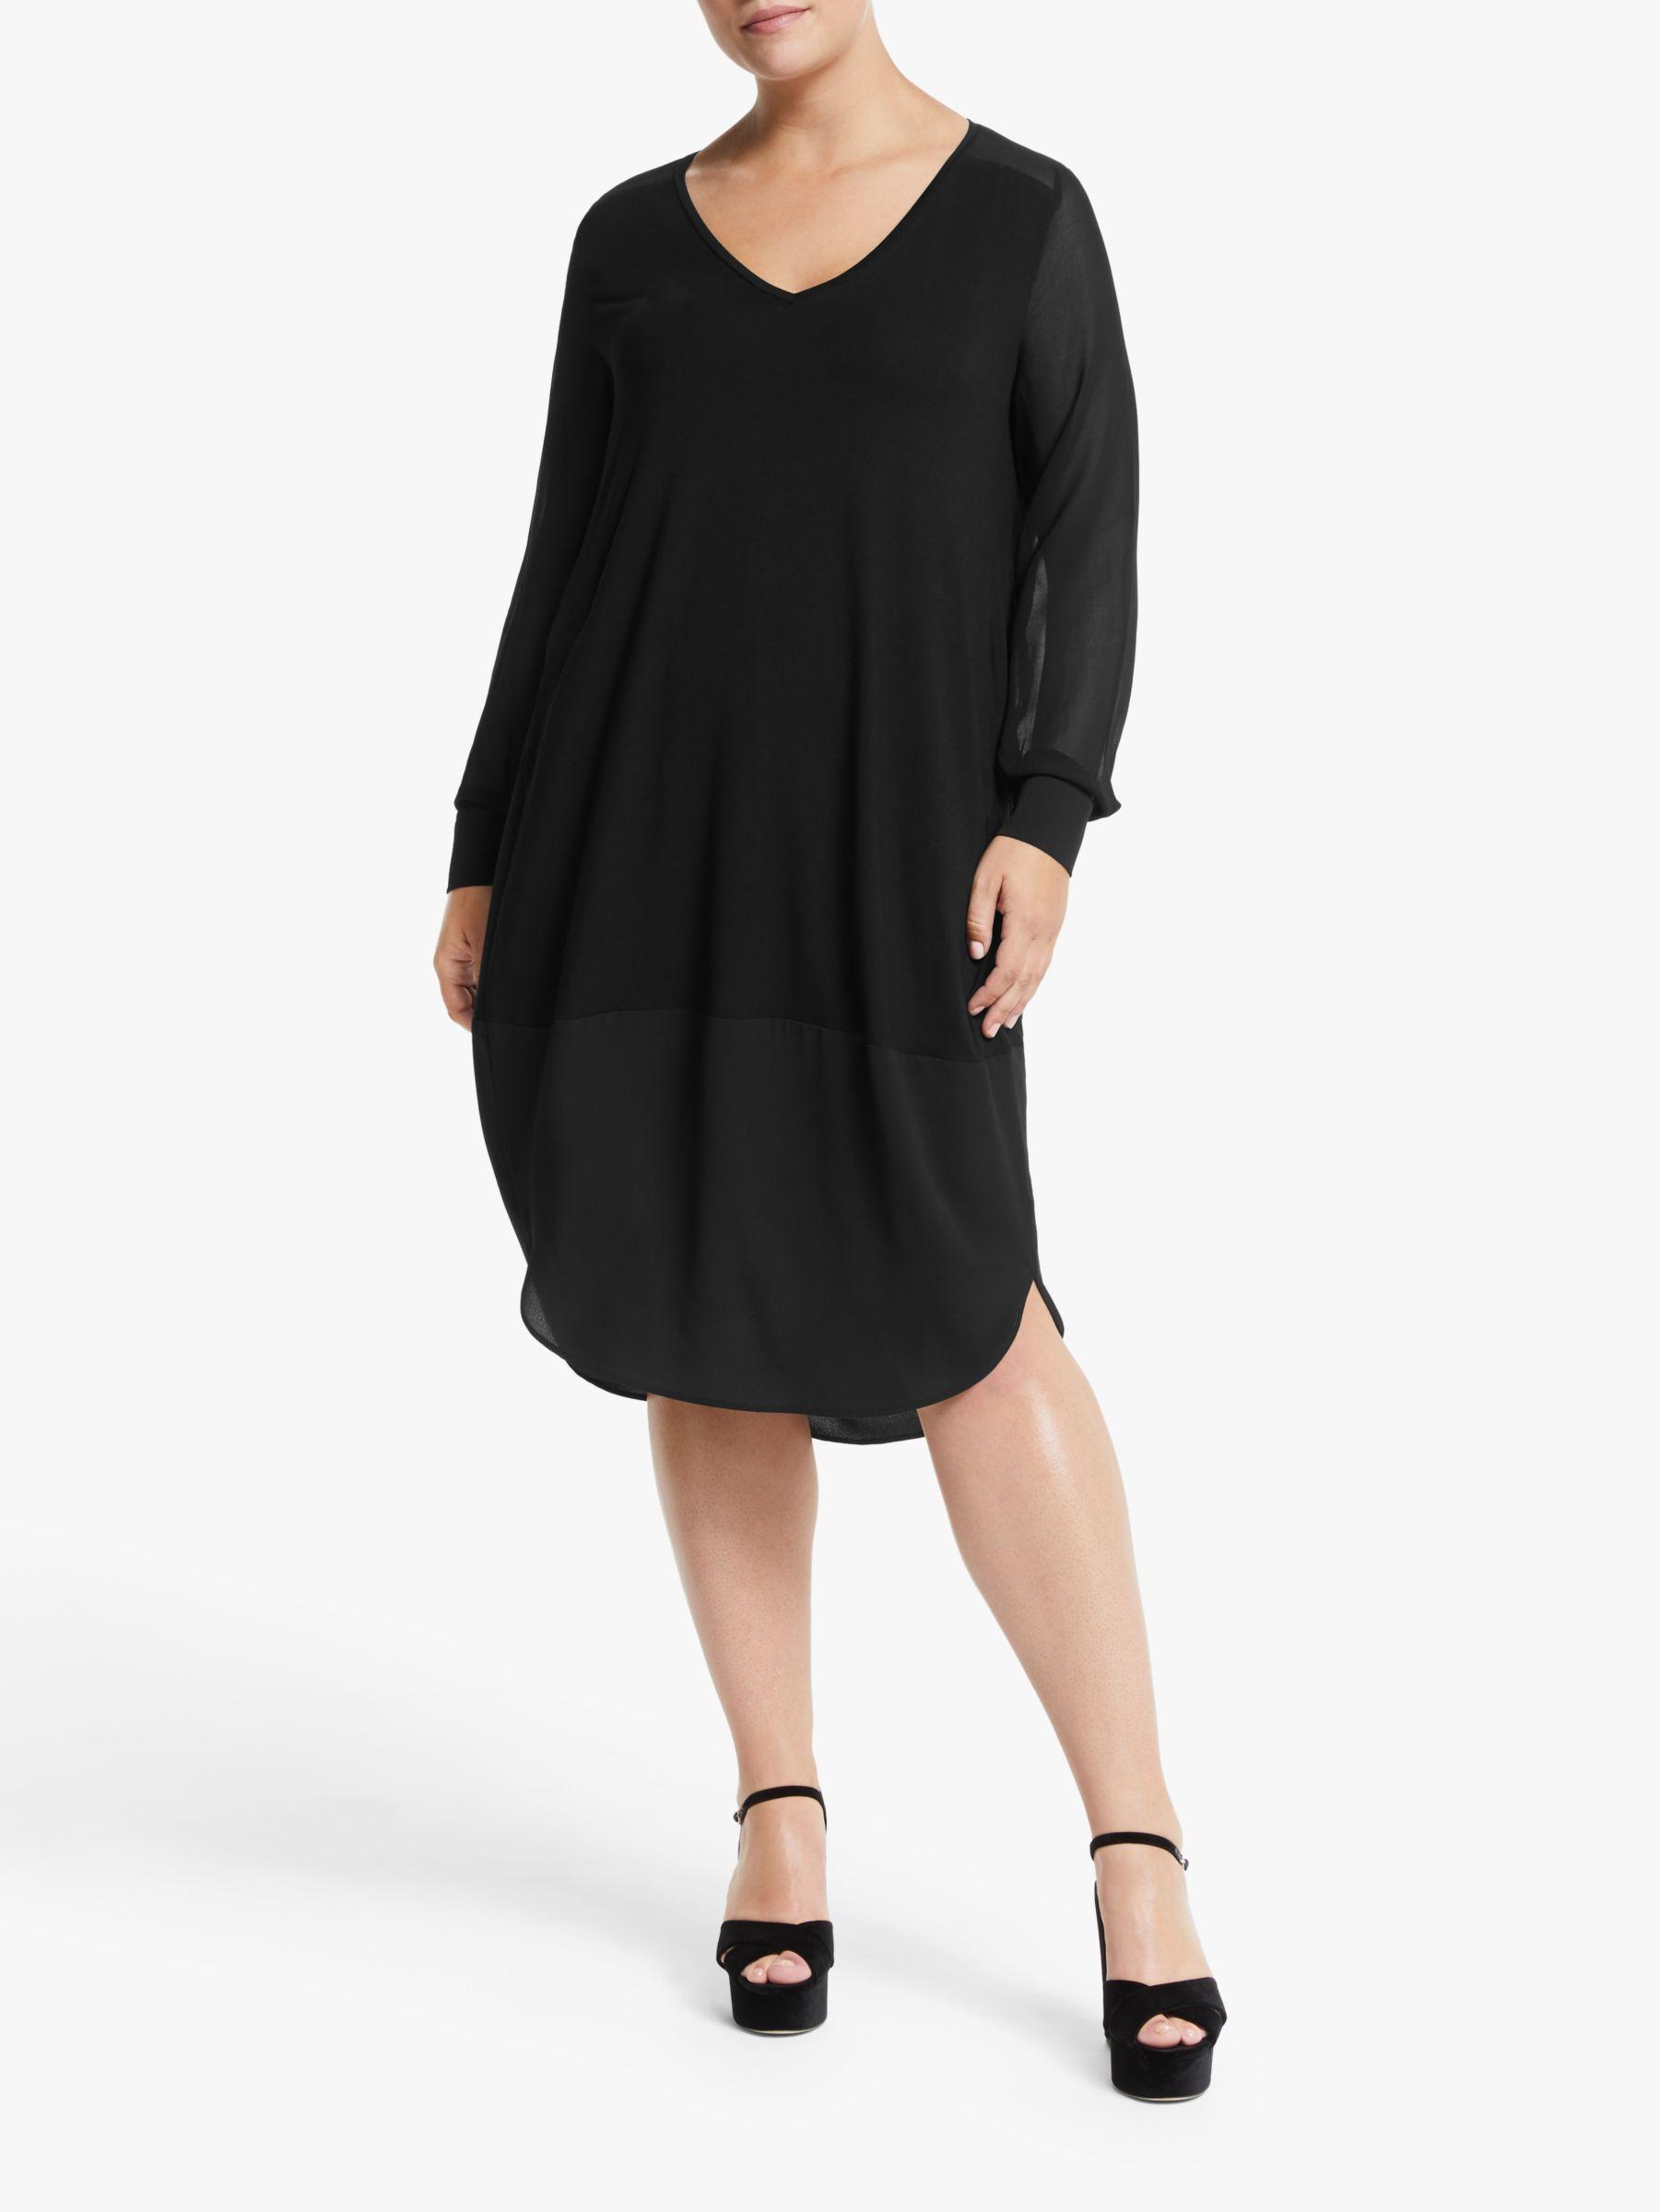 Persona by Marina Rinaldi Persona by Marina Rinaldi Long Sleeve Jersey Dress, Black